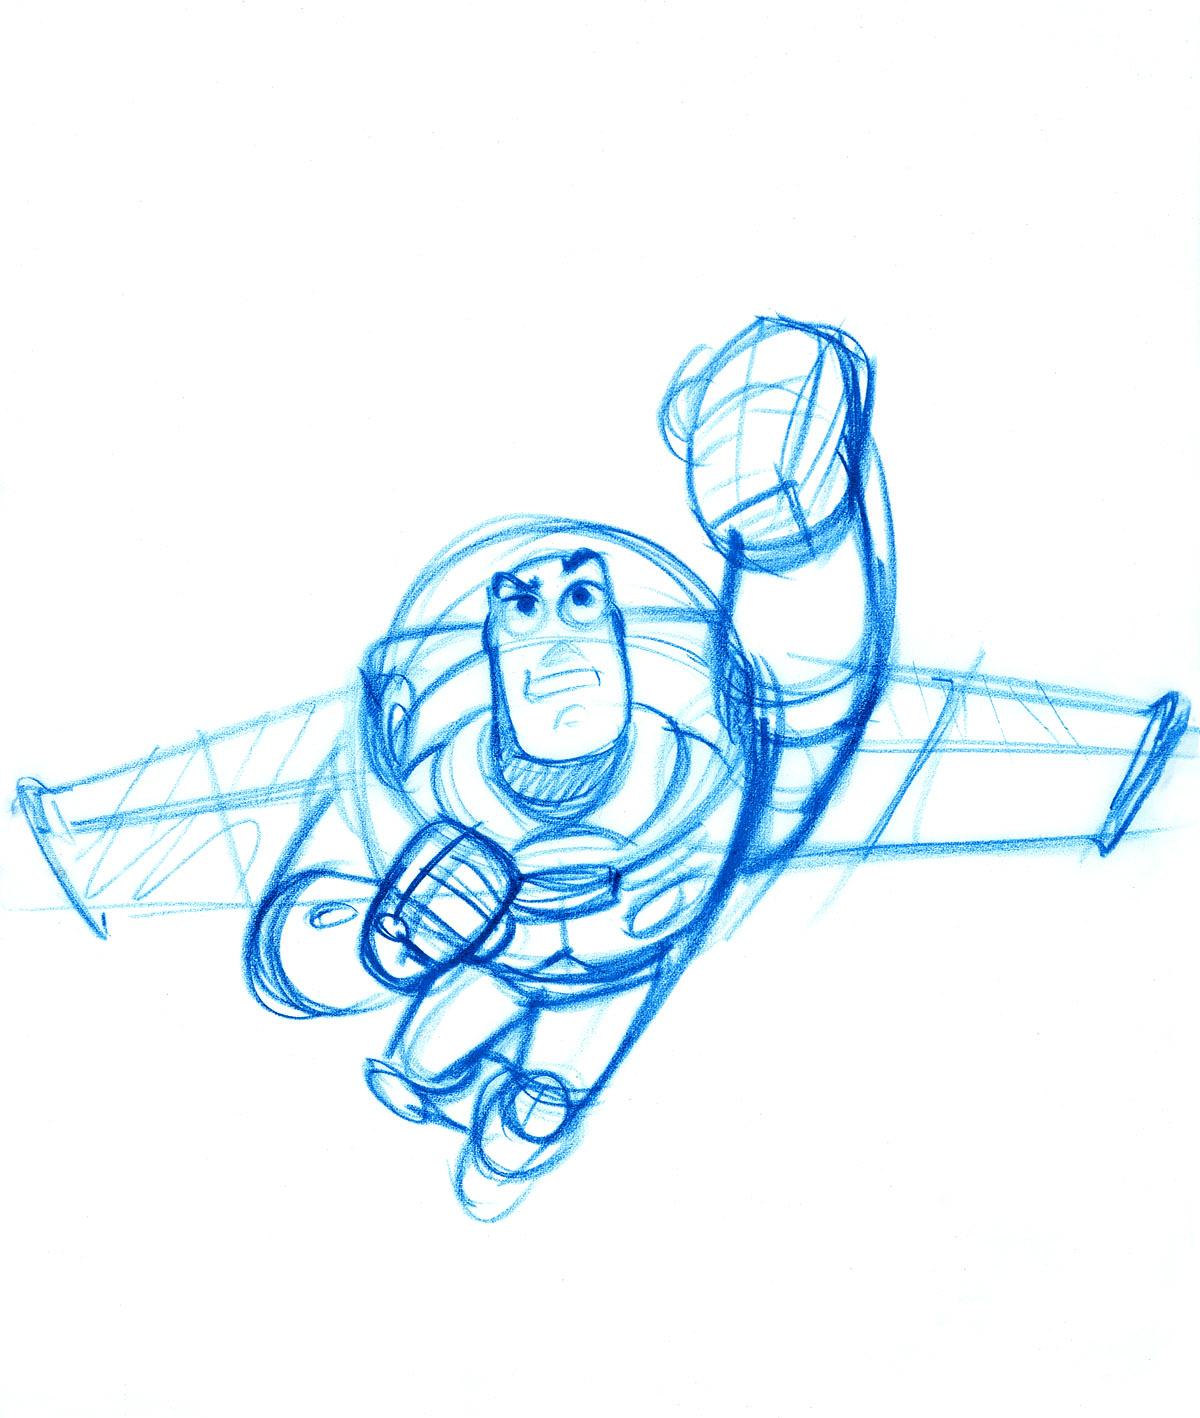 Buzz Lightyear drawn by Bob Pauley